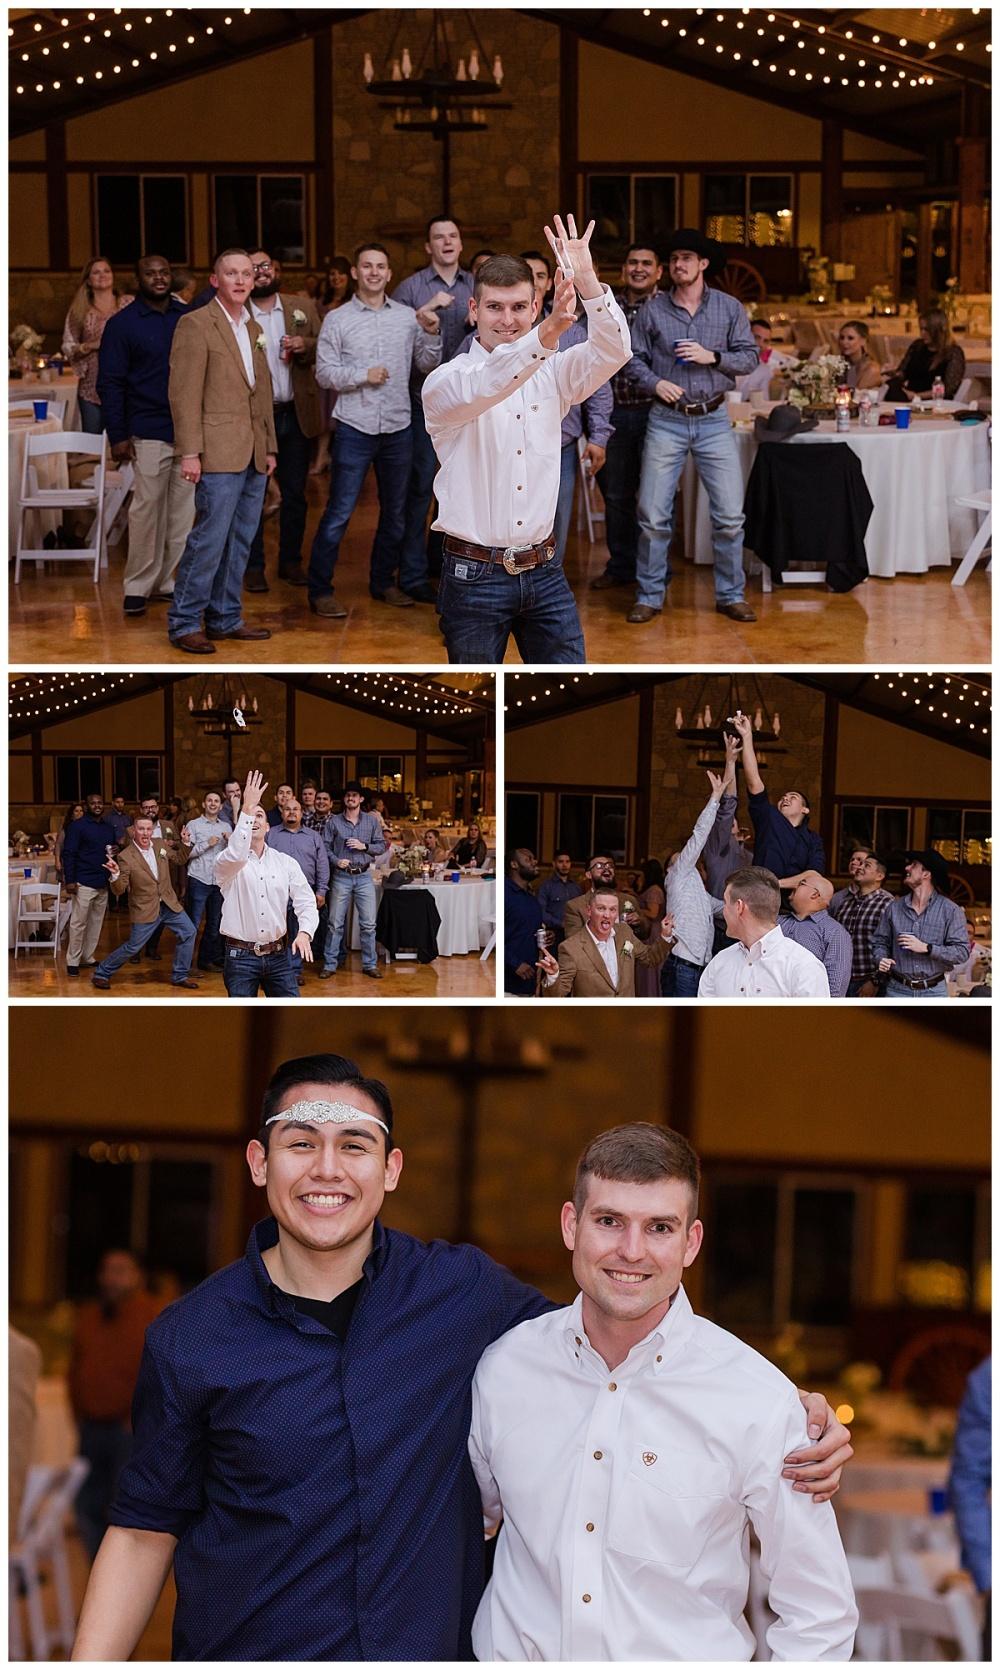 Wedding-Photographer-Texas-Hill-Country-Happy-H-Ranch-Comfor-Texas-Carly-Barton-Photography_0087.jpg